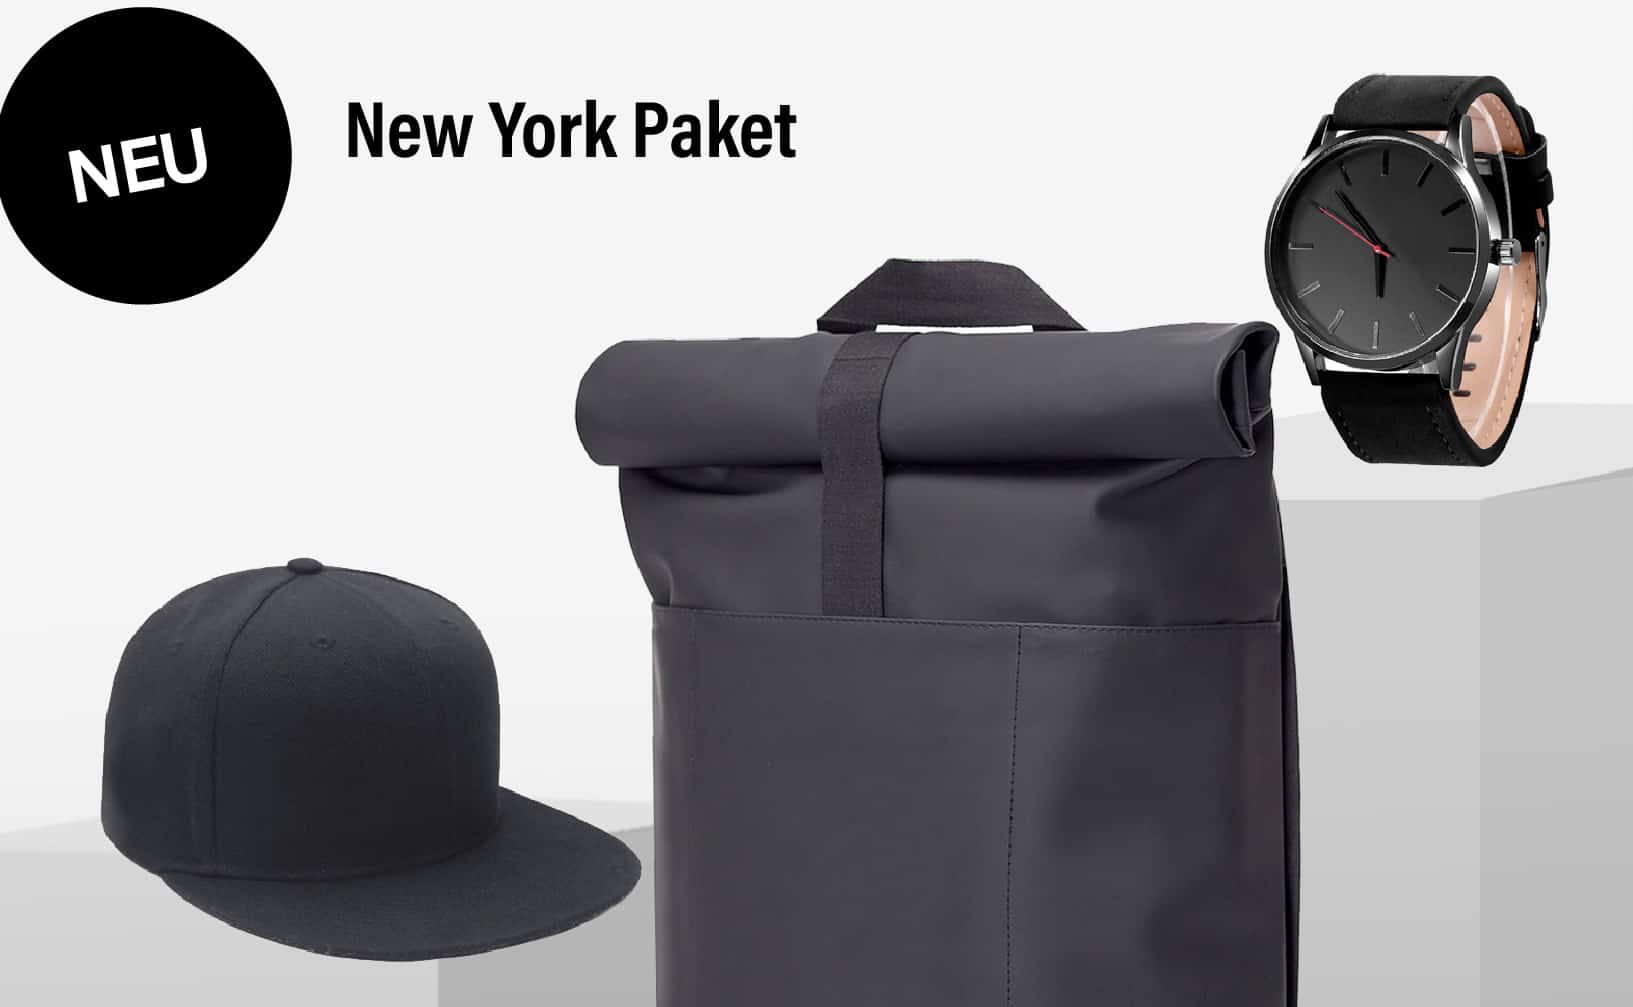 STYLEKRONE »New York Paket« Ucon Acrobatics Lotus HAJO Rucksack + Edelstahl Uhr Black Edition mit Leder-Armband Schwarz + Cap Black Edition aus Canvas